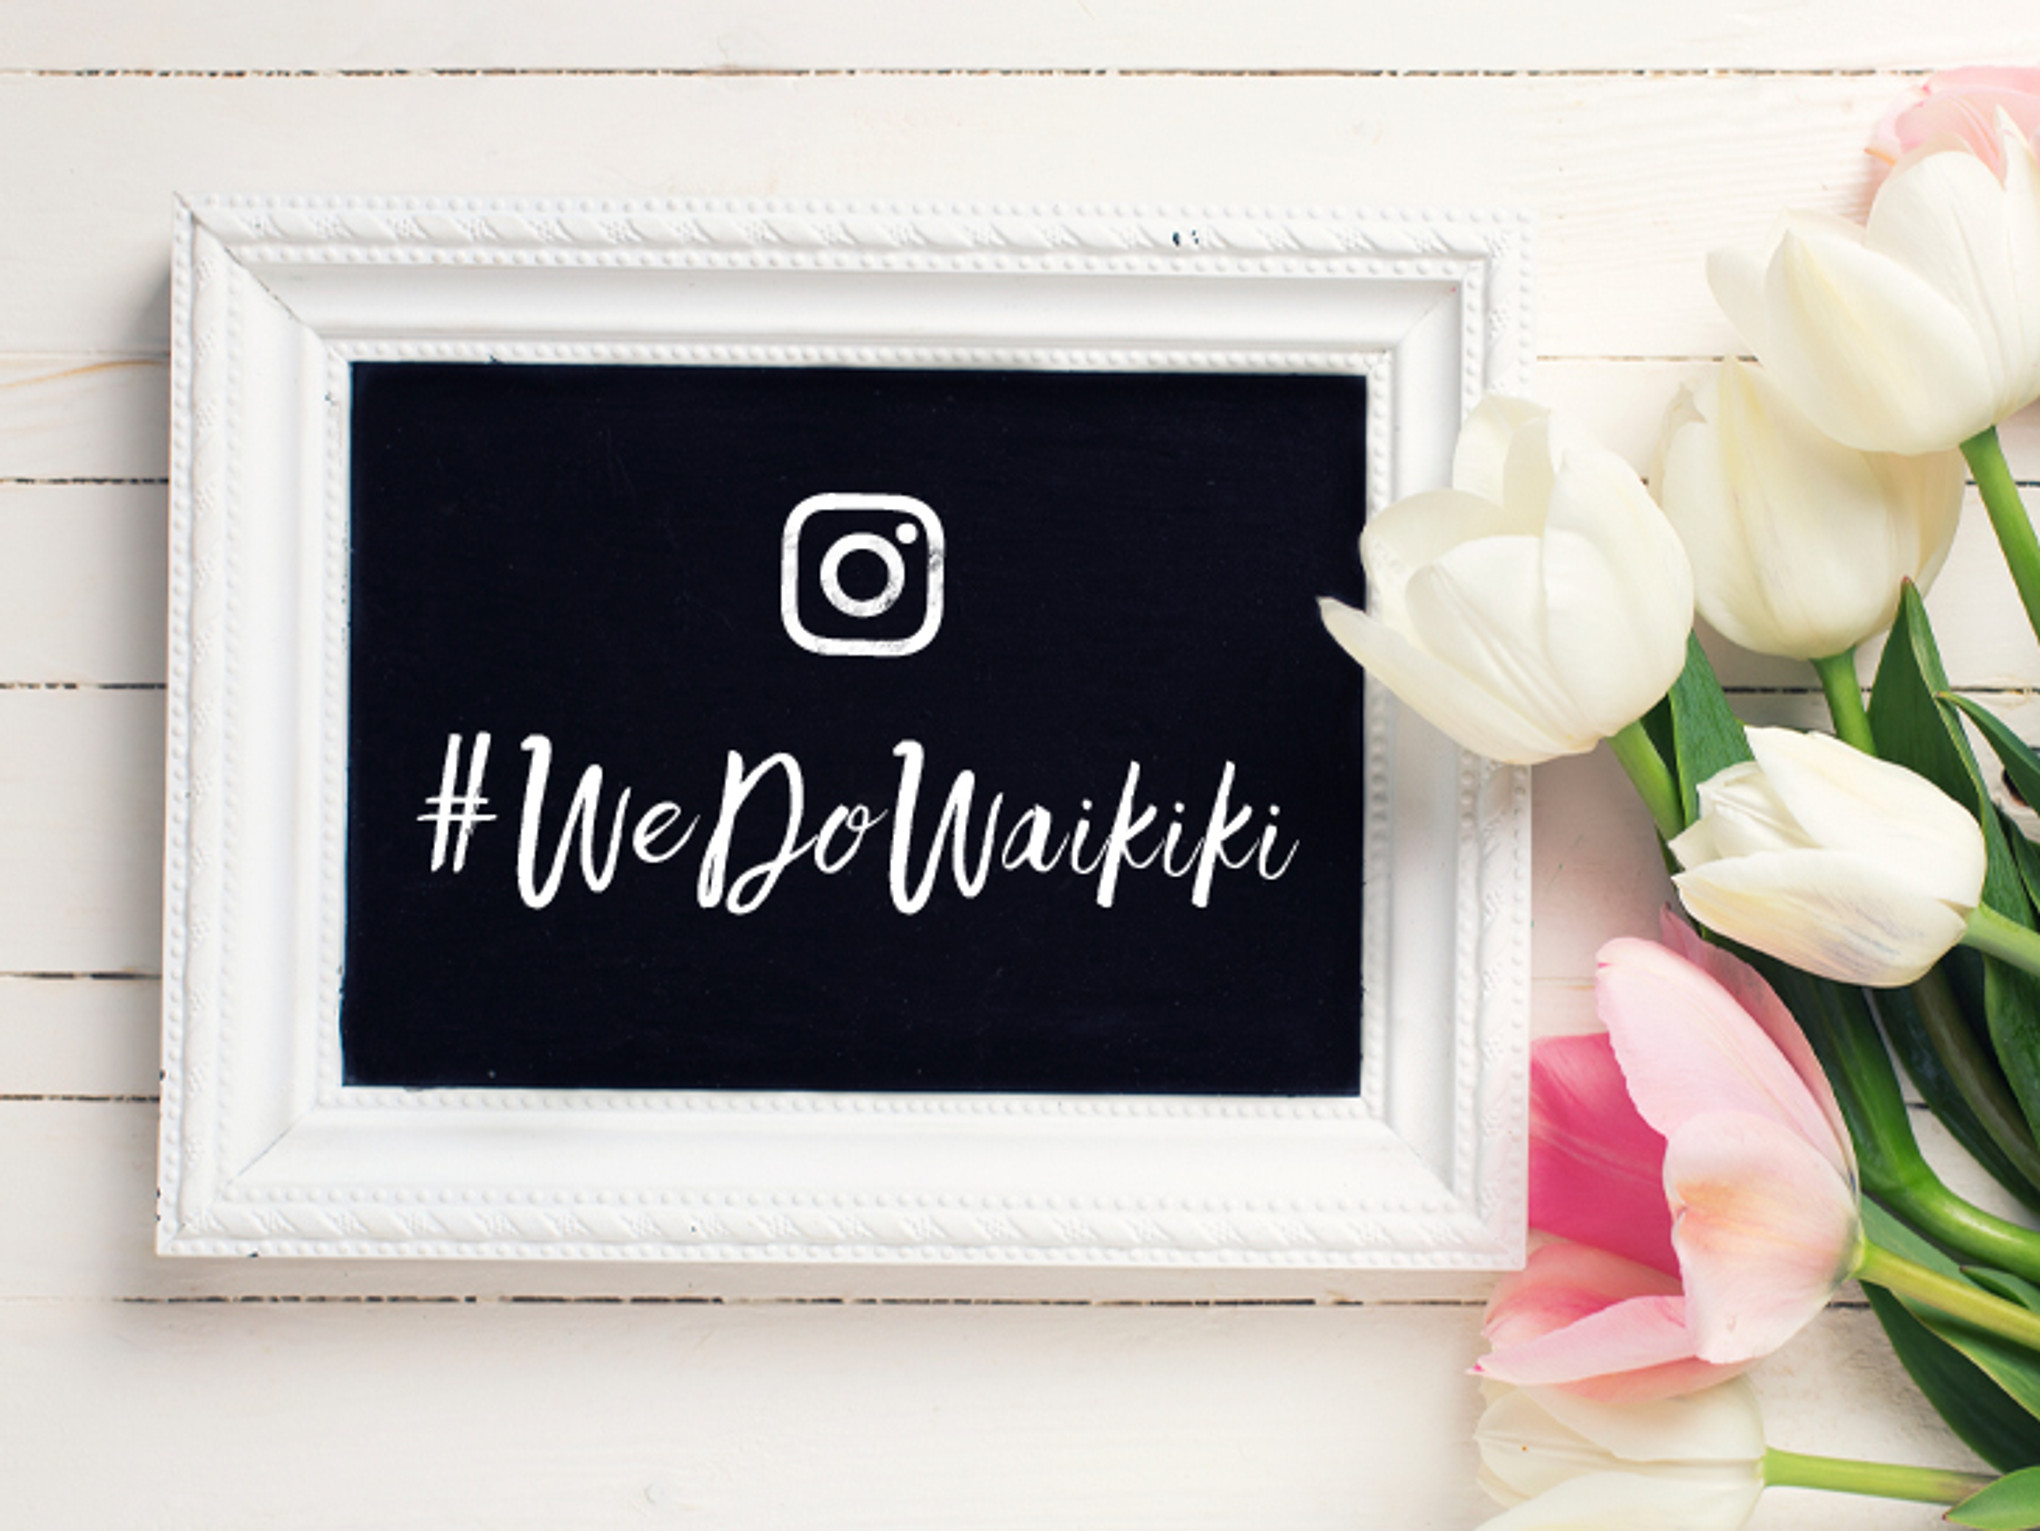 Wedding Hashtag Generator The Knot.10 Creative And Memorable Wedding Hashtag Ideas Bridestory